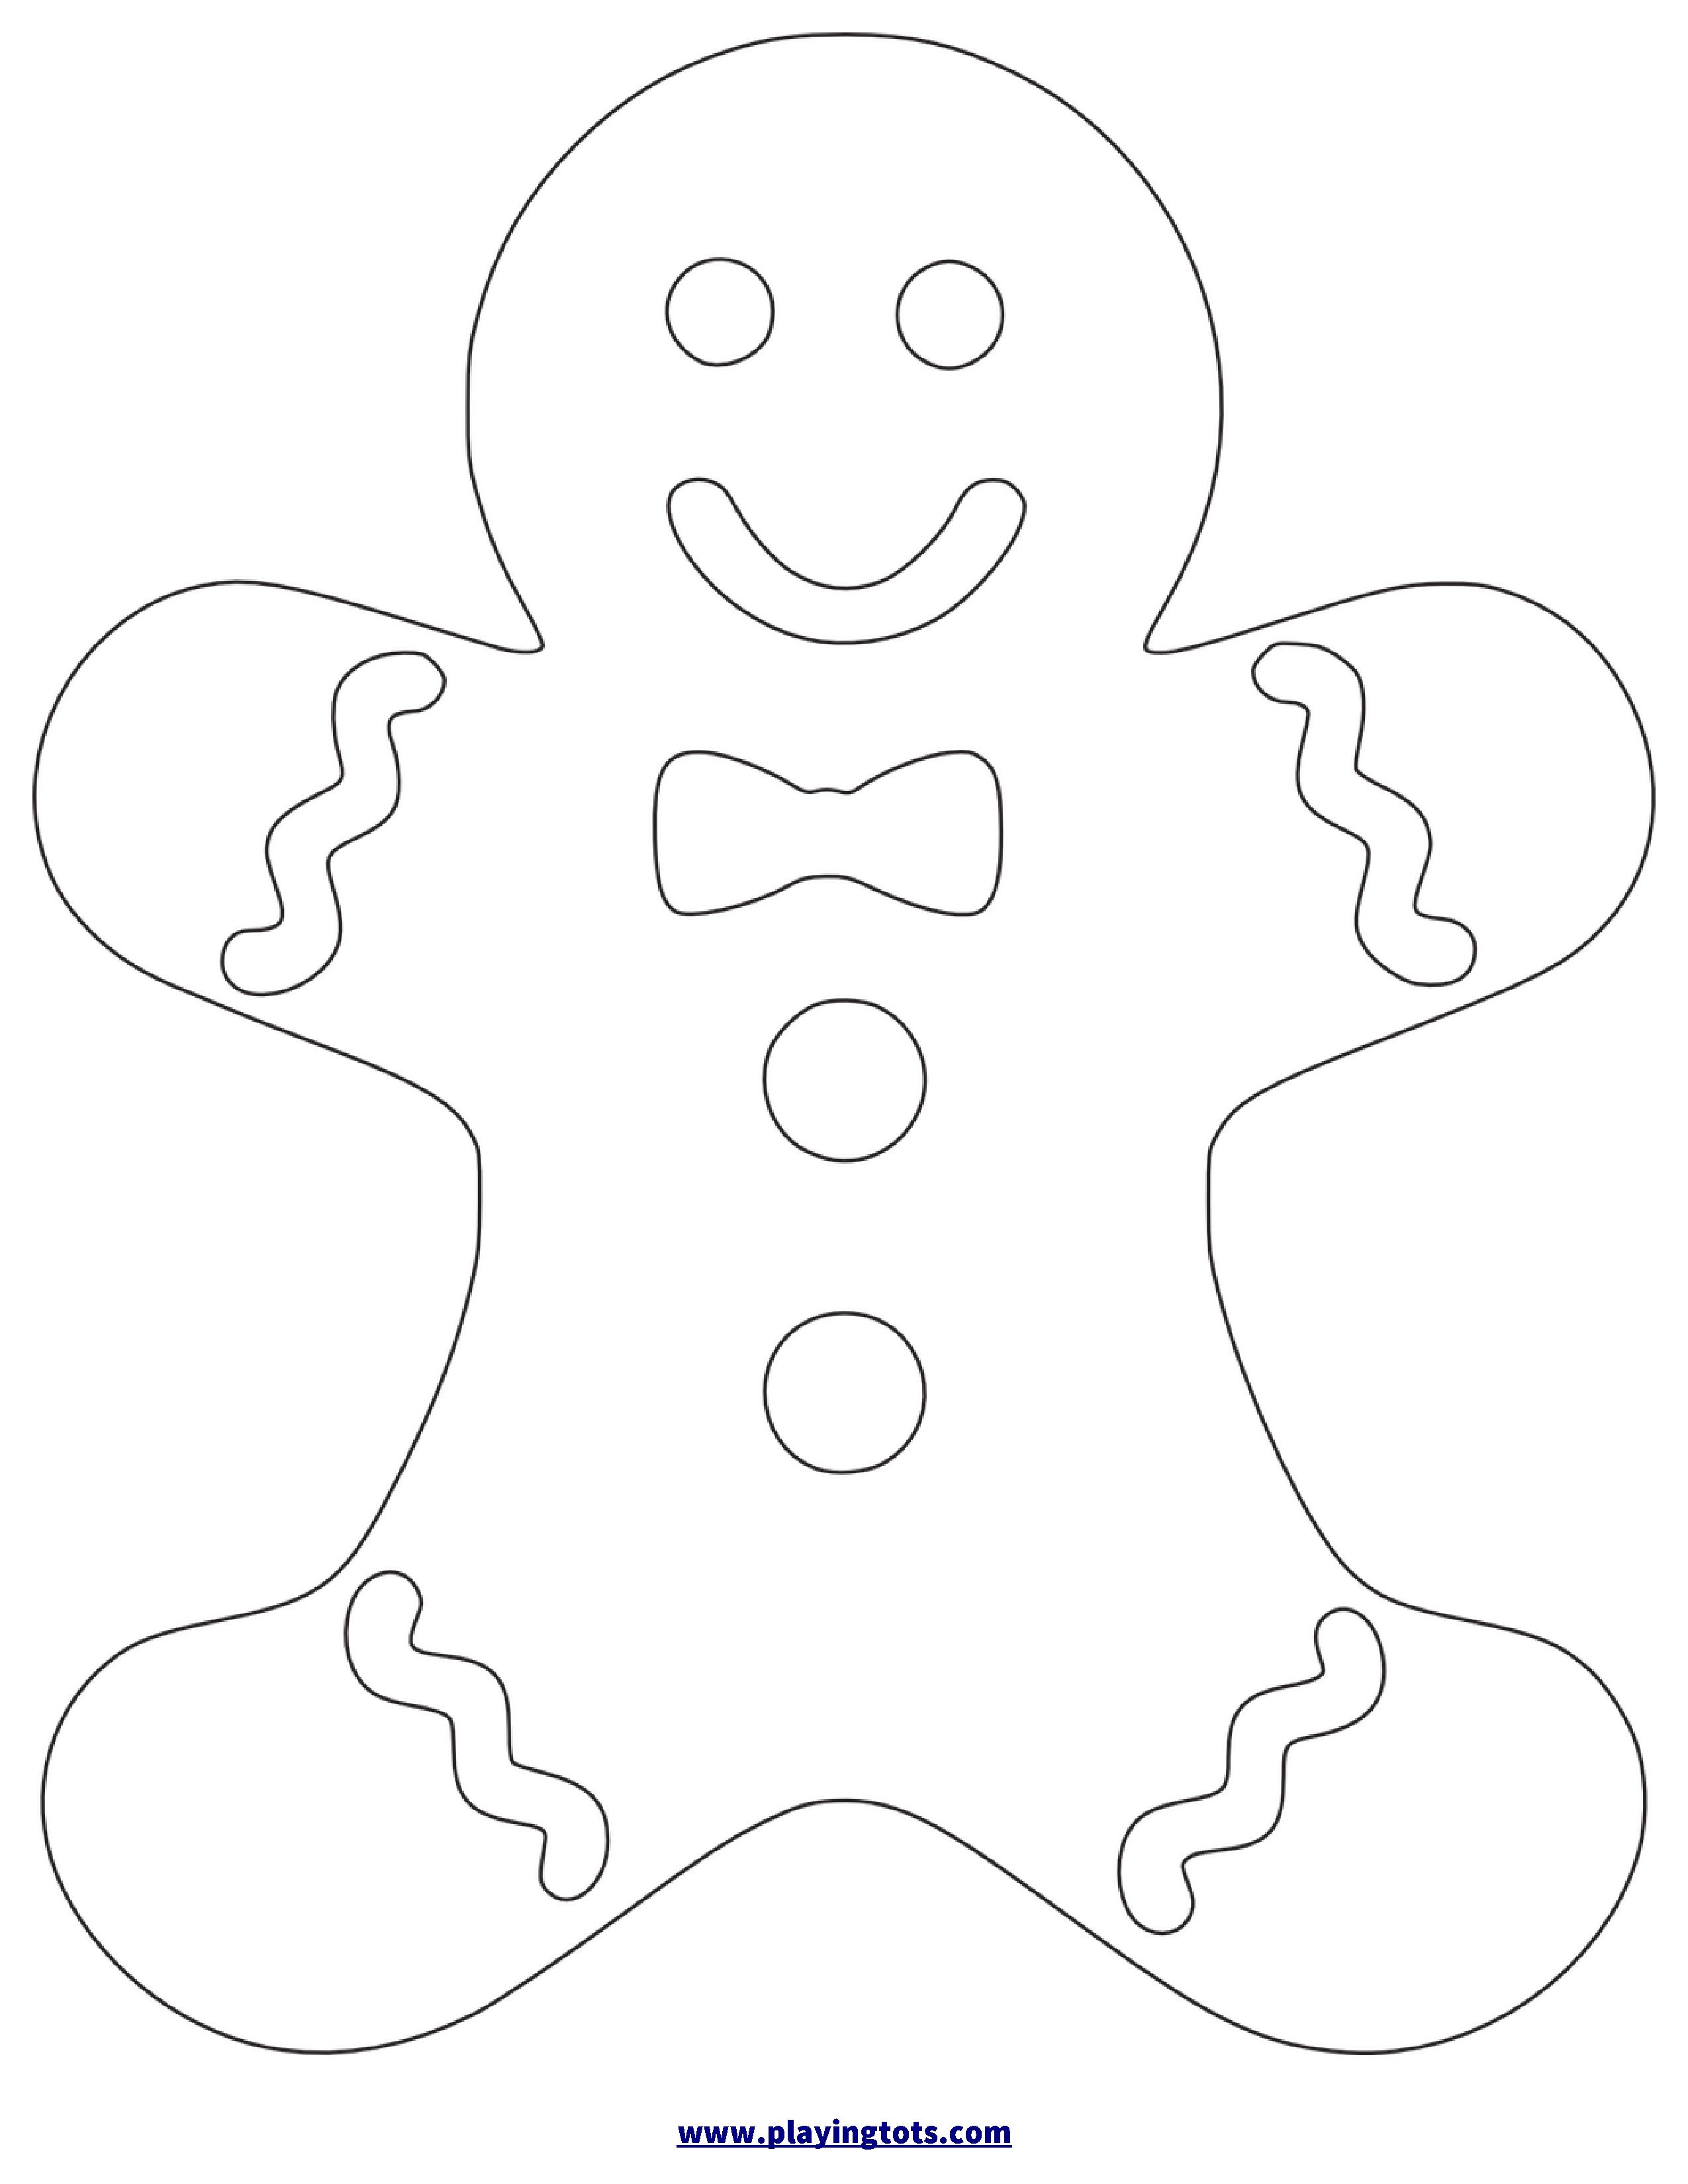 Free Printable Gingerbread Man Worksheet